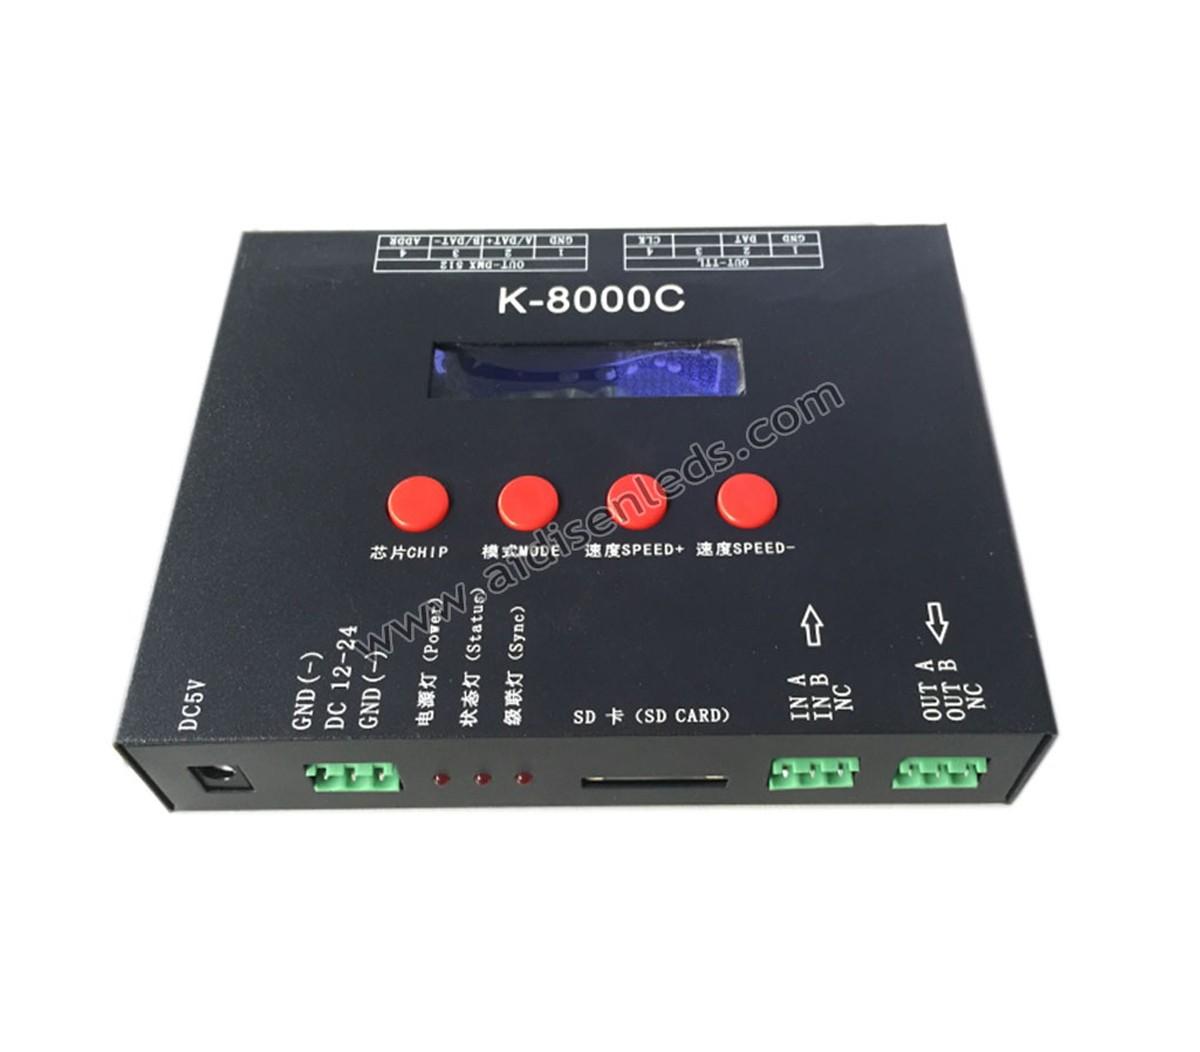 Performance characteristics of street light controller